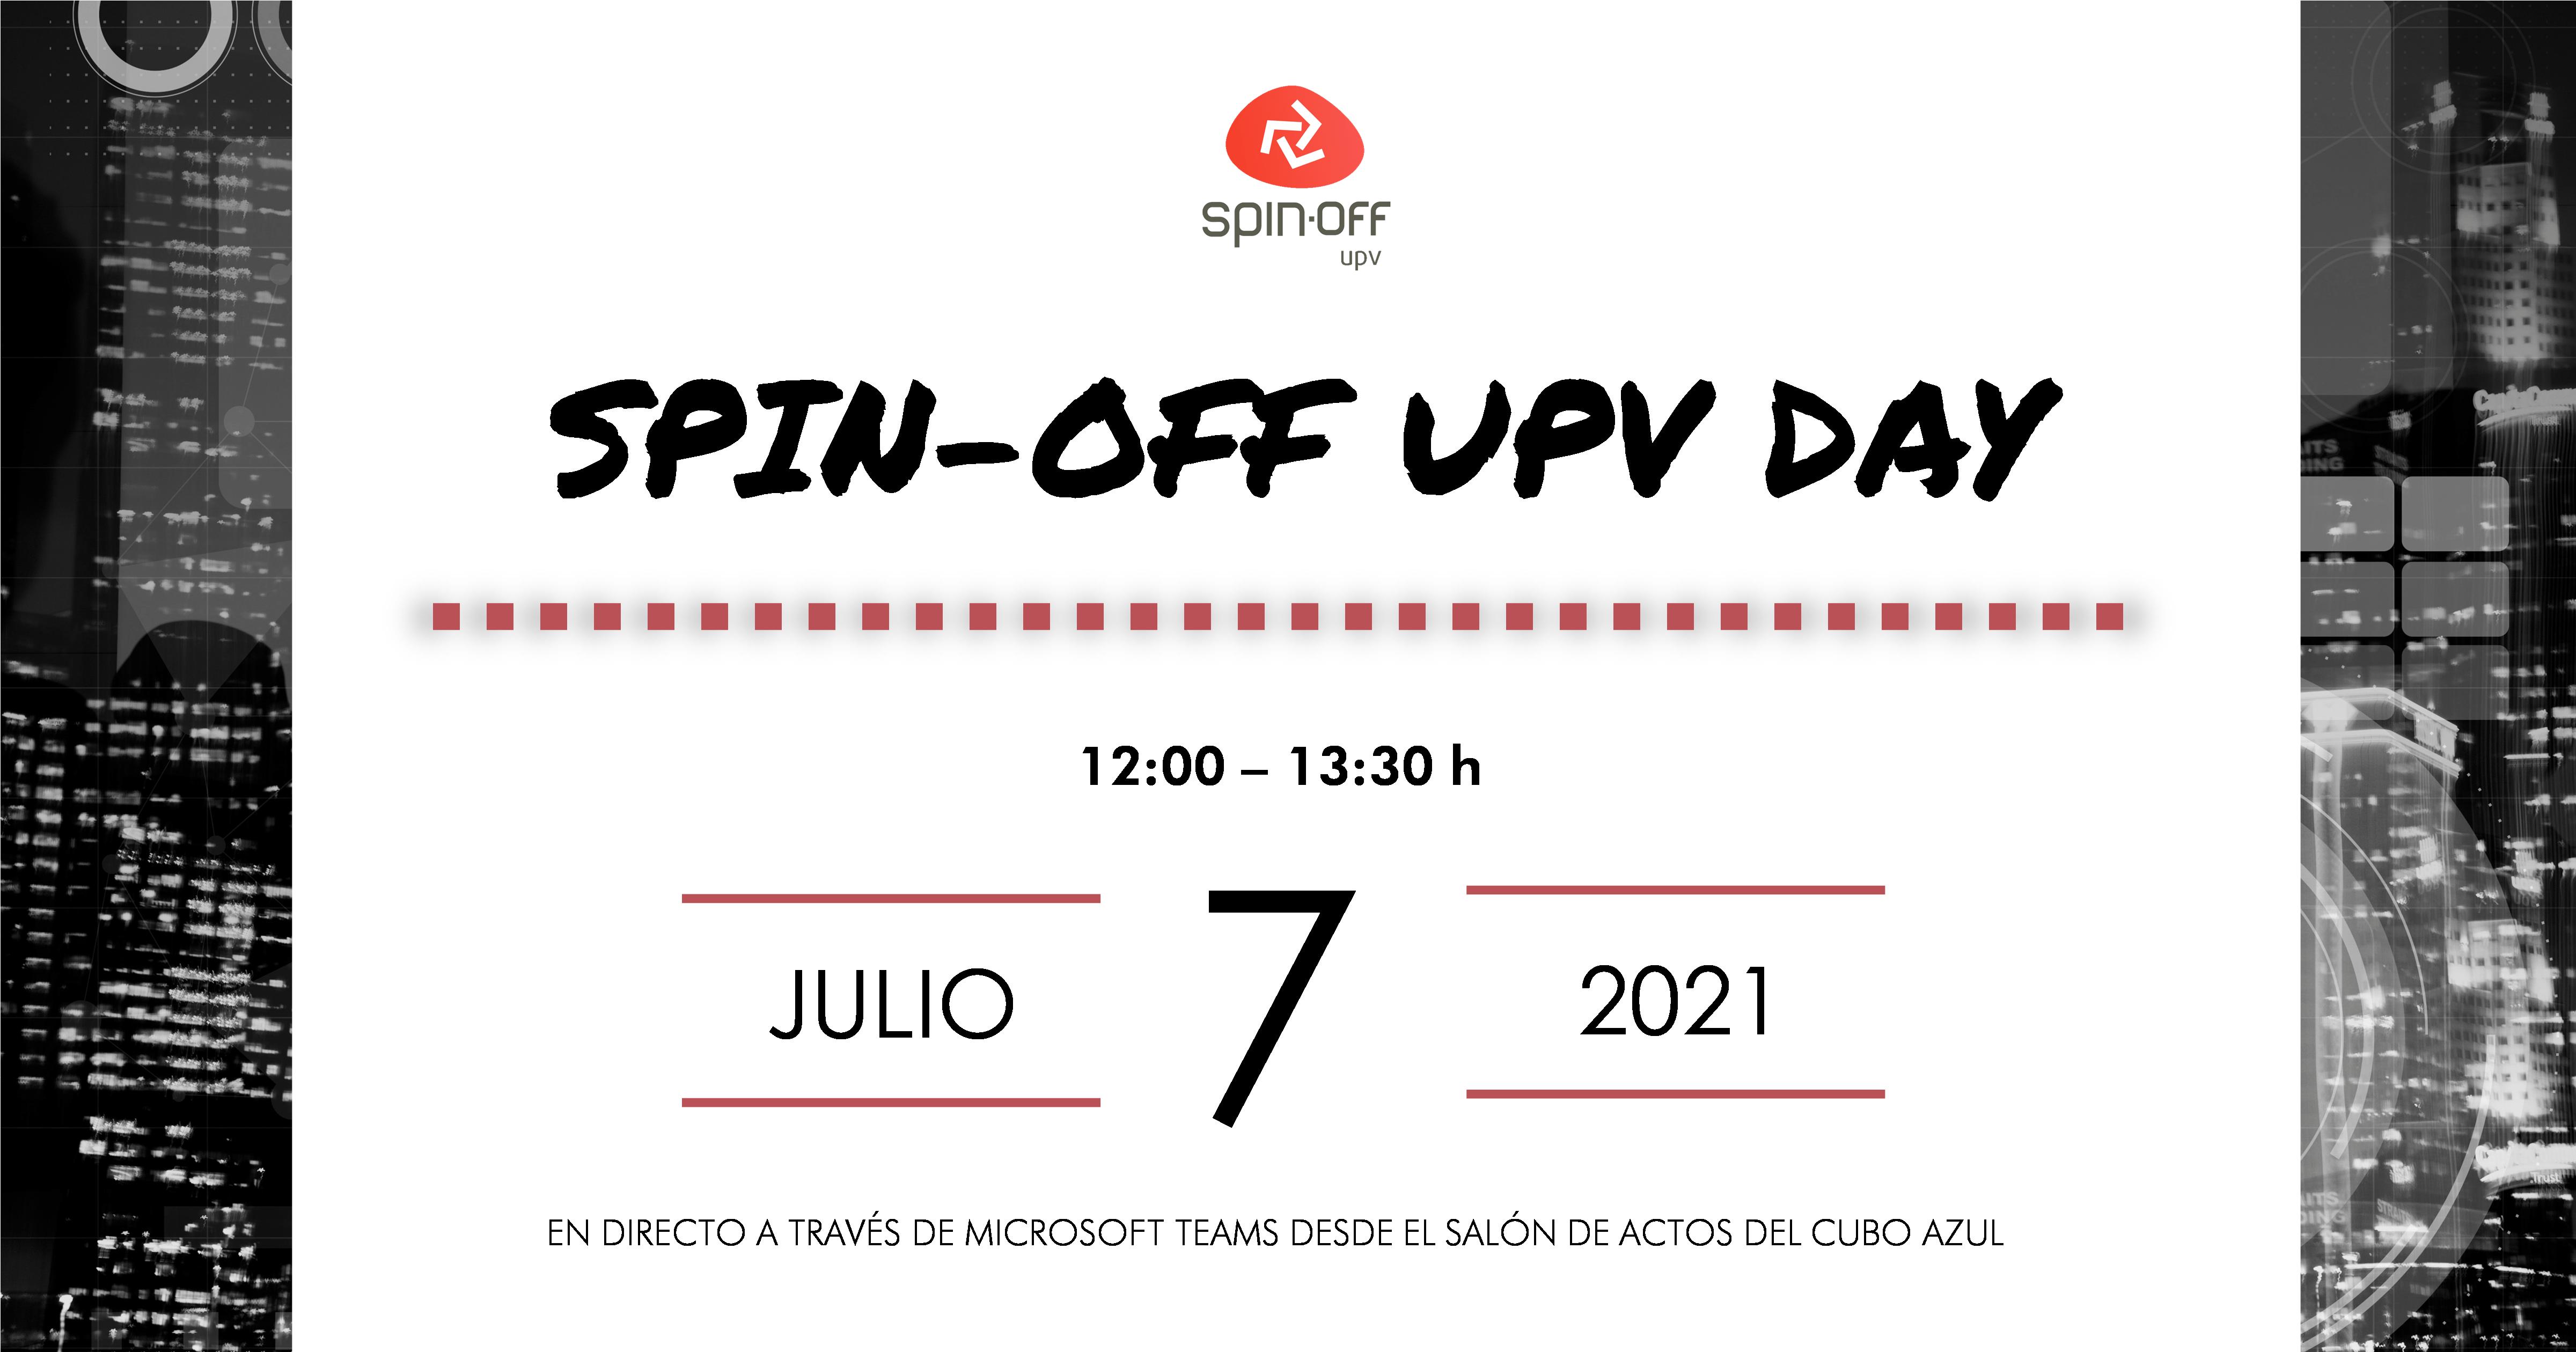 spin off upv day imagen